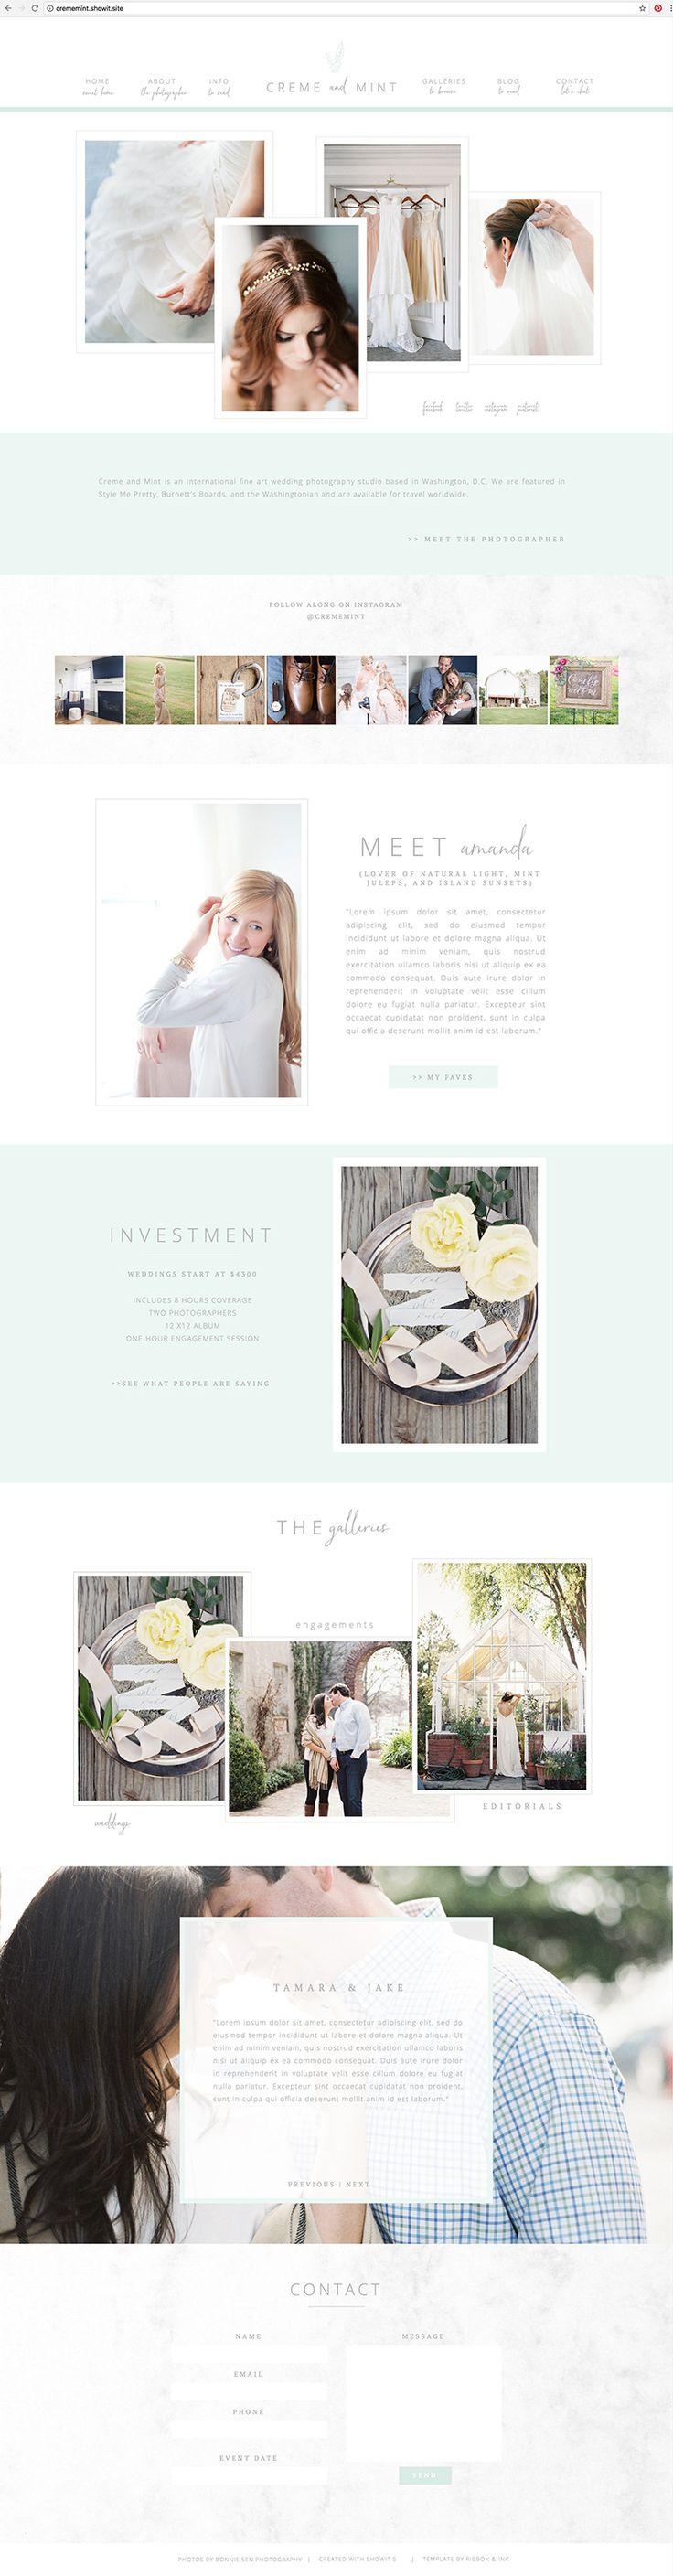 showit5 / website template / photographer website / branding / brand design / web design / website design